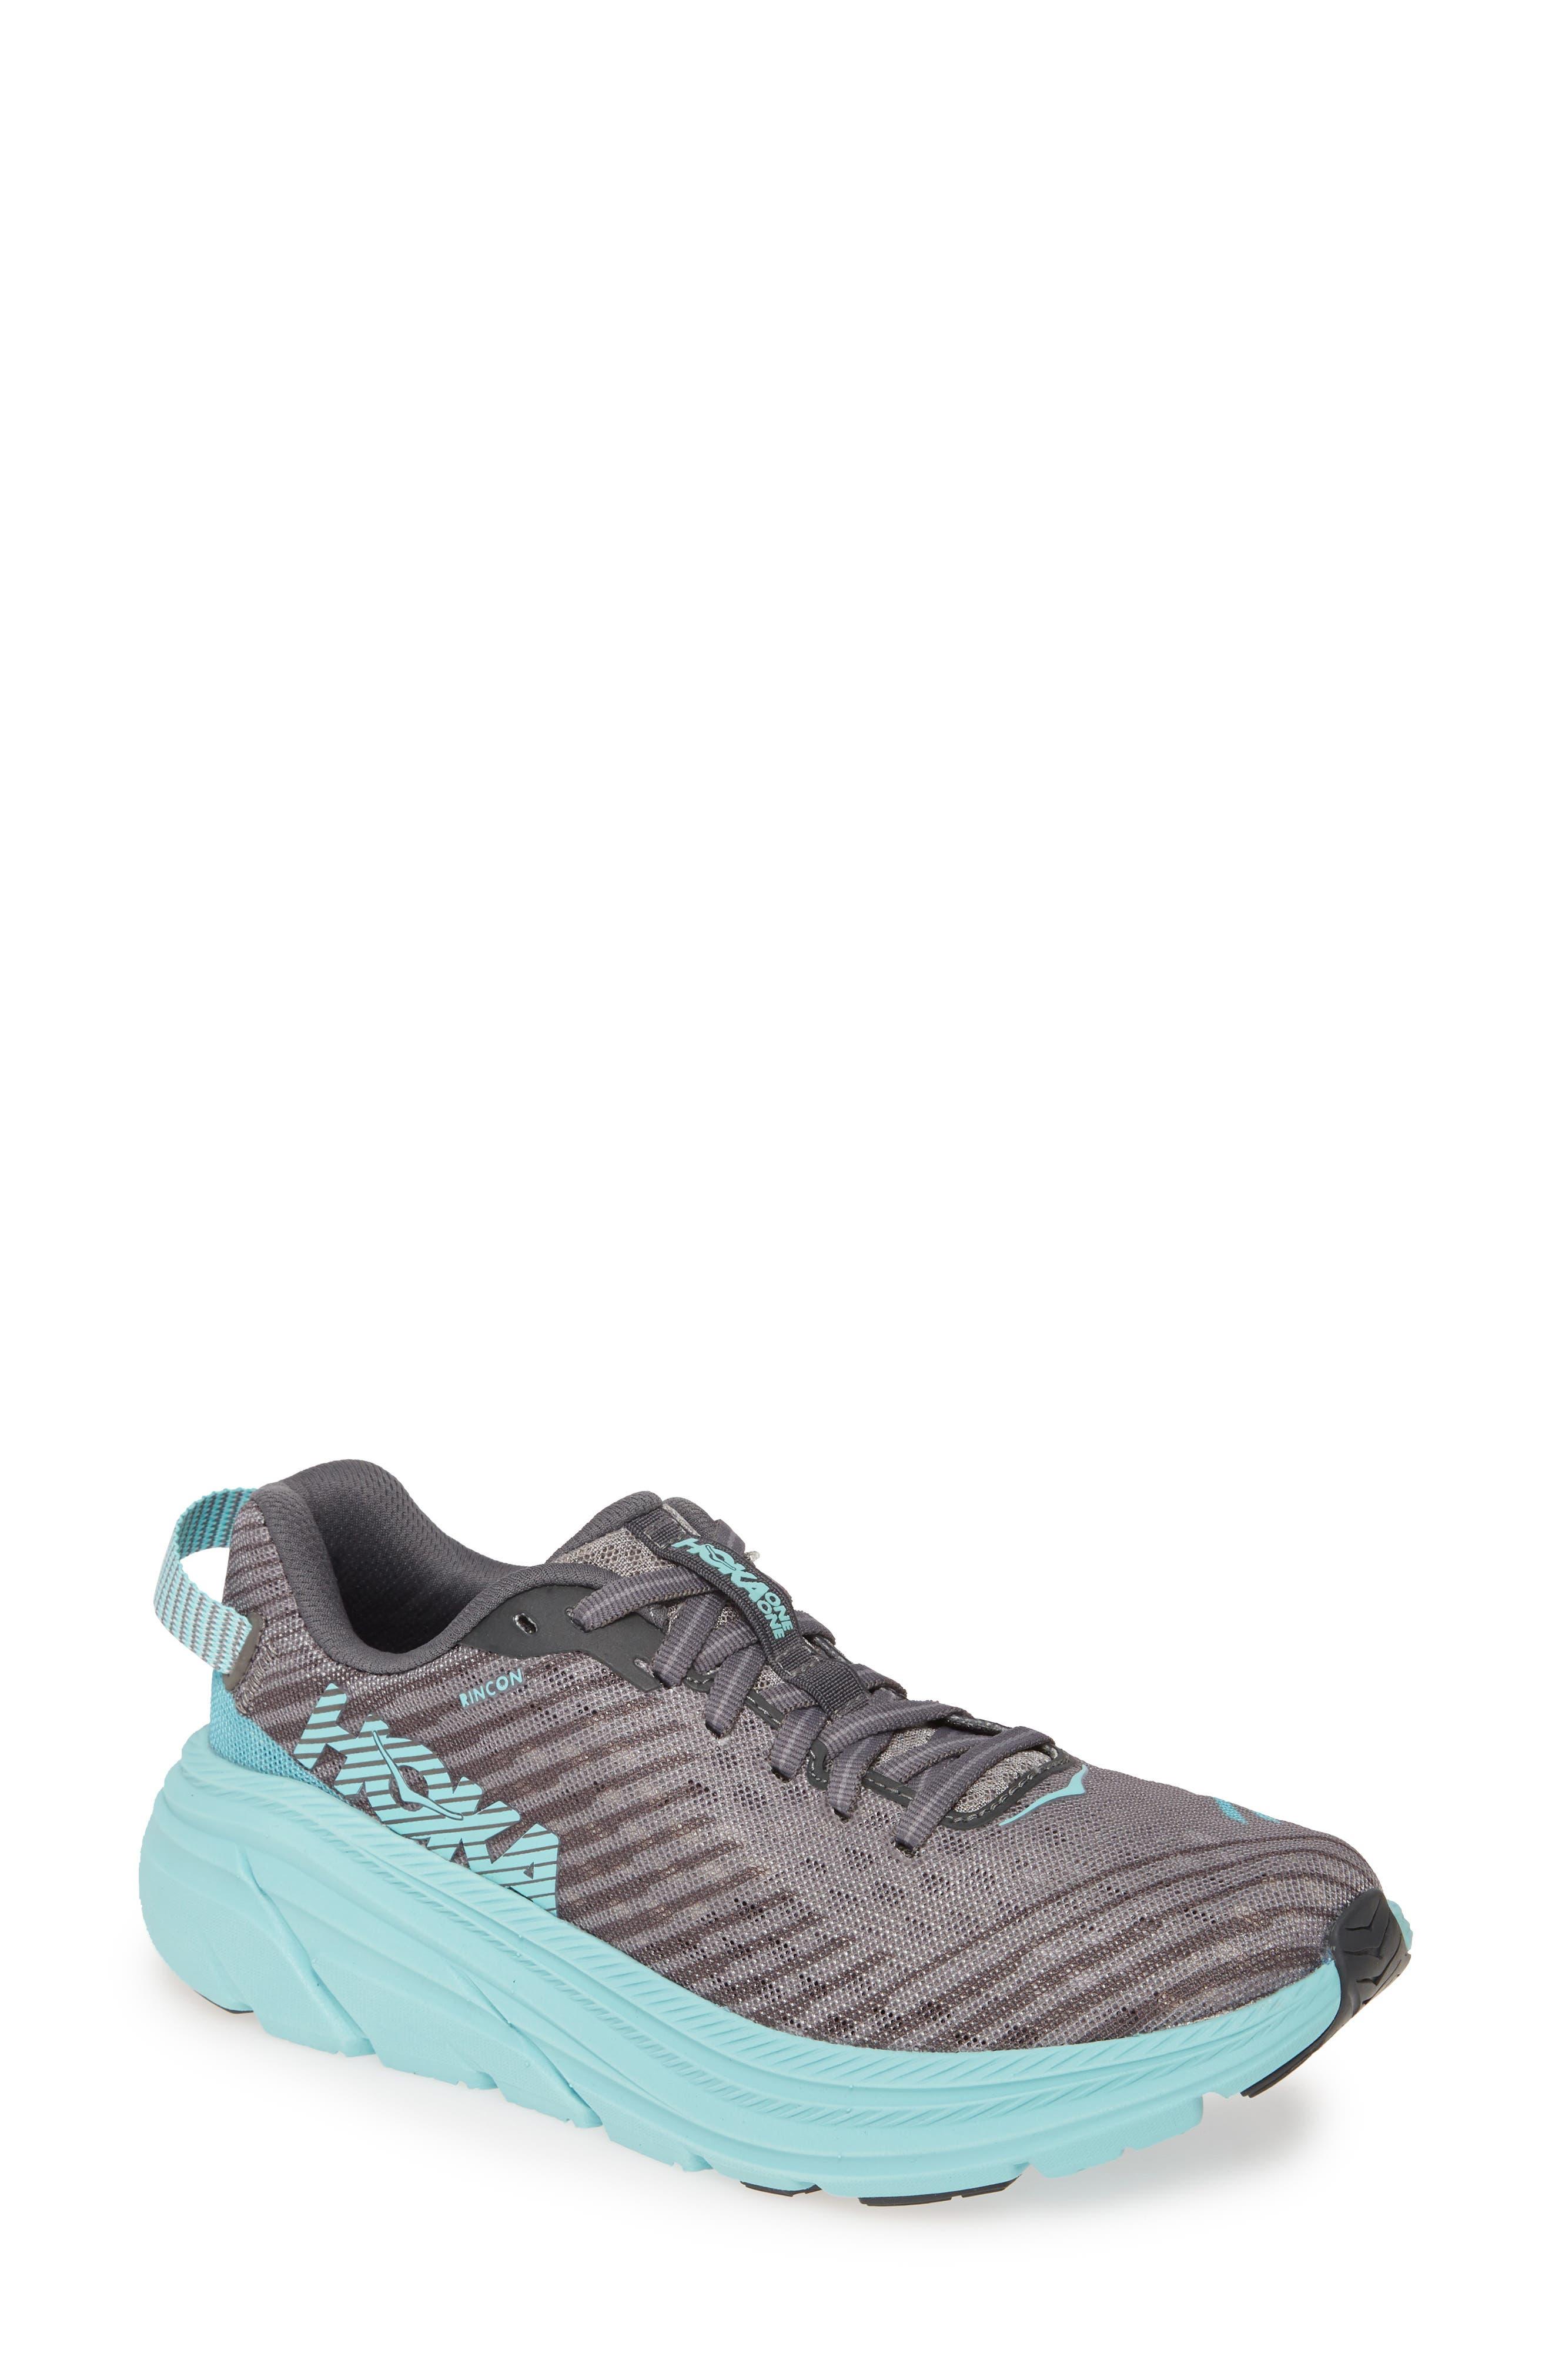 Hoka One One Rincon Running Shoe- Grey